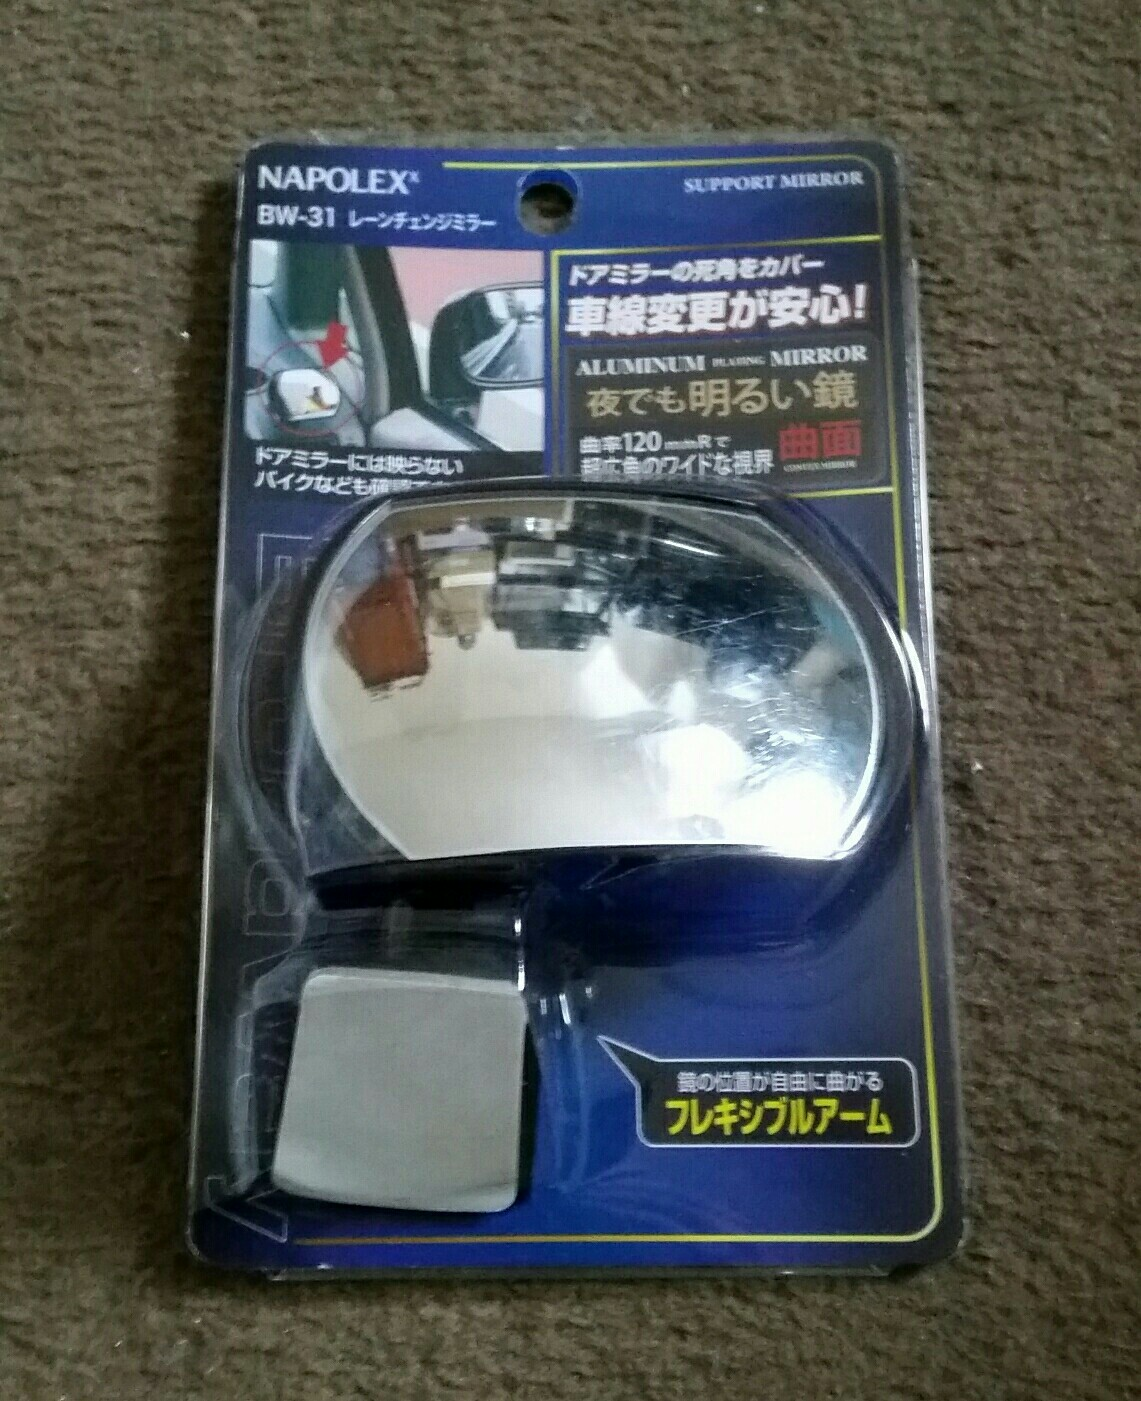 NAPOLEX BW-31 レーンチェンジミラー